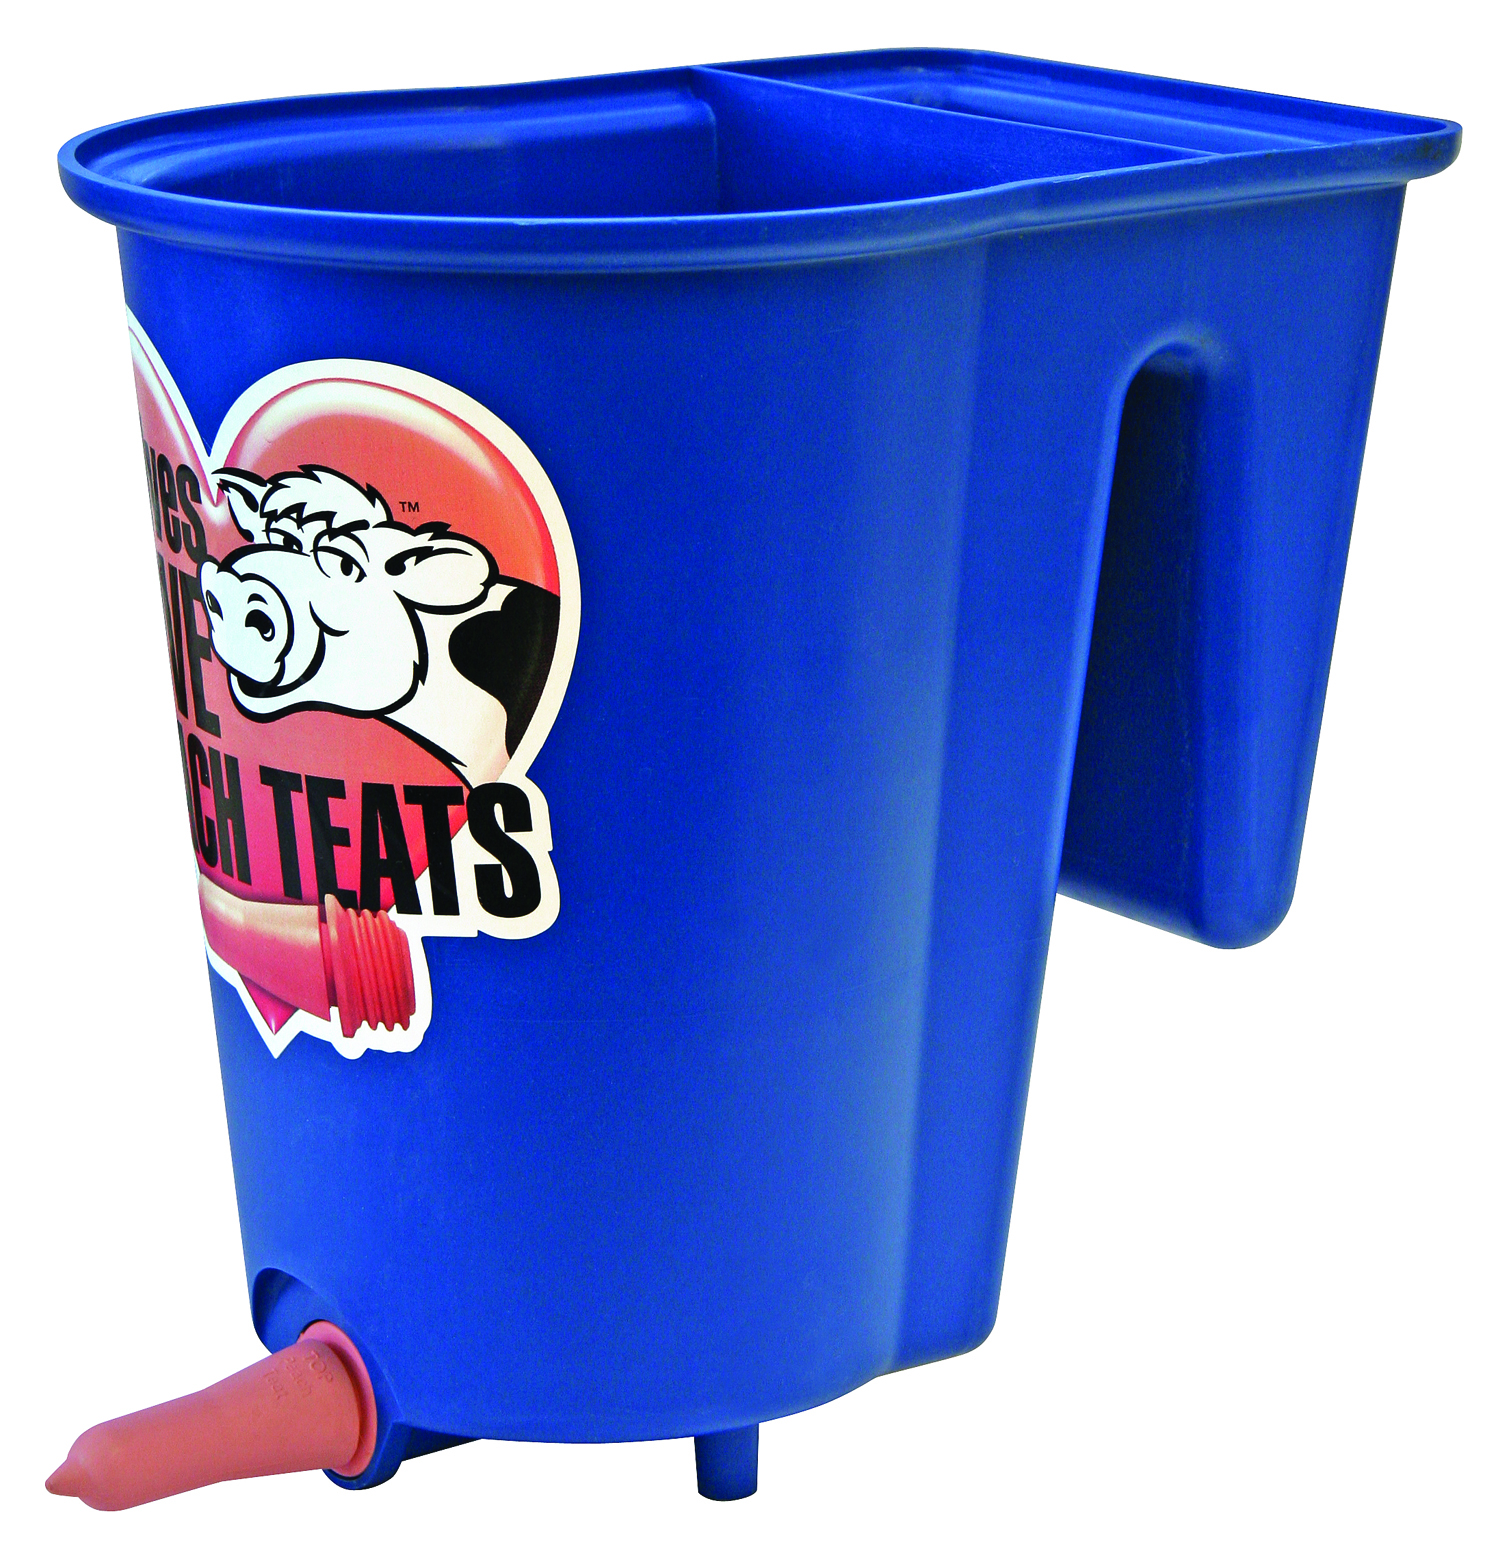 Peach Teat Single Calf Bucket Feeder